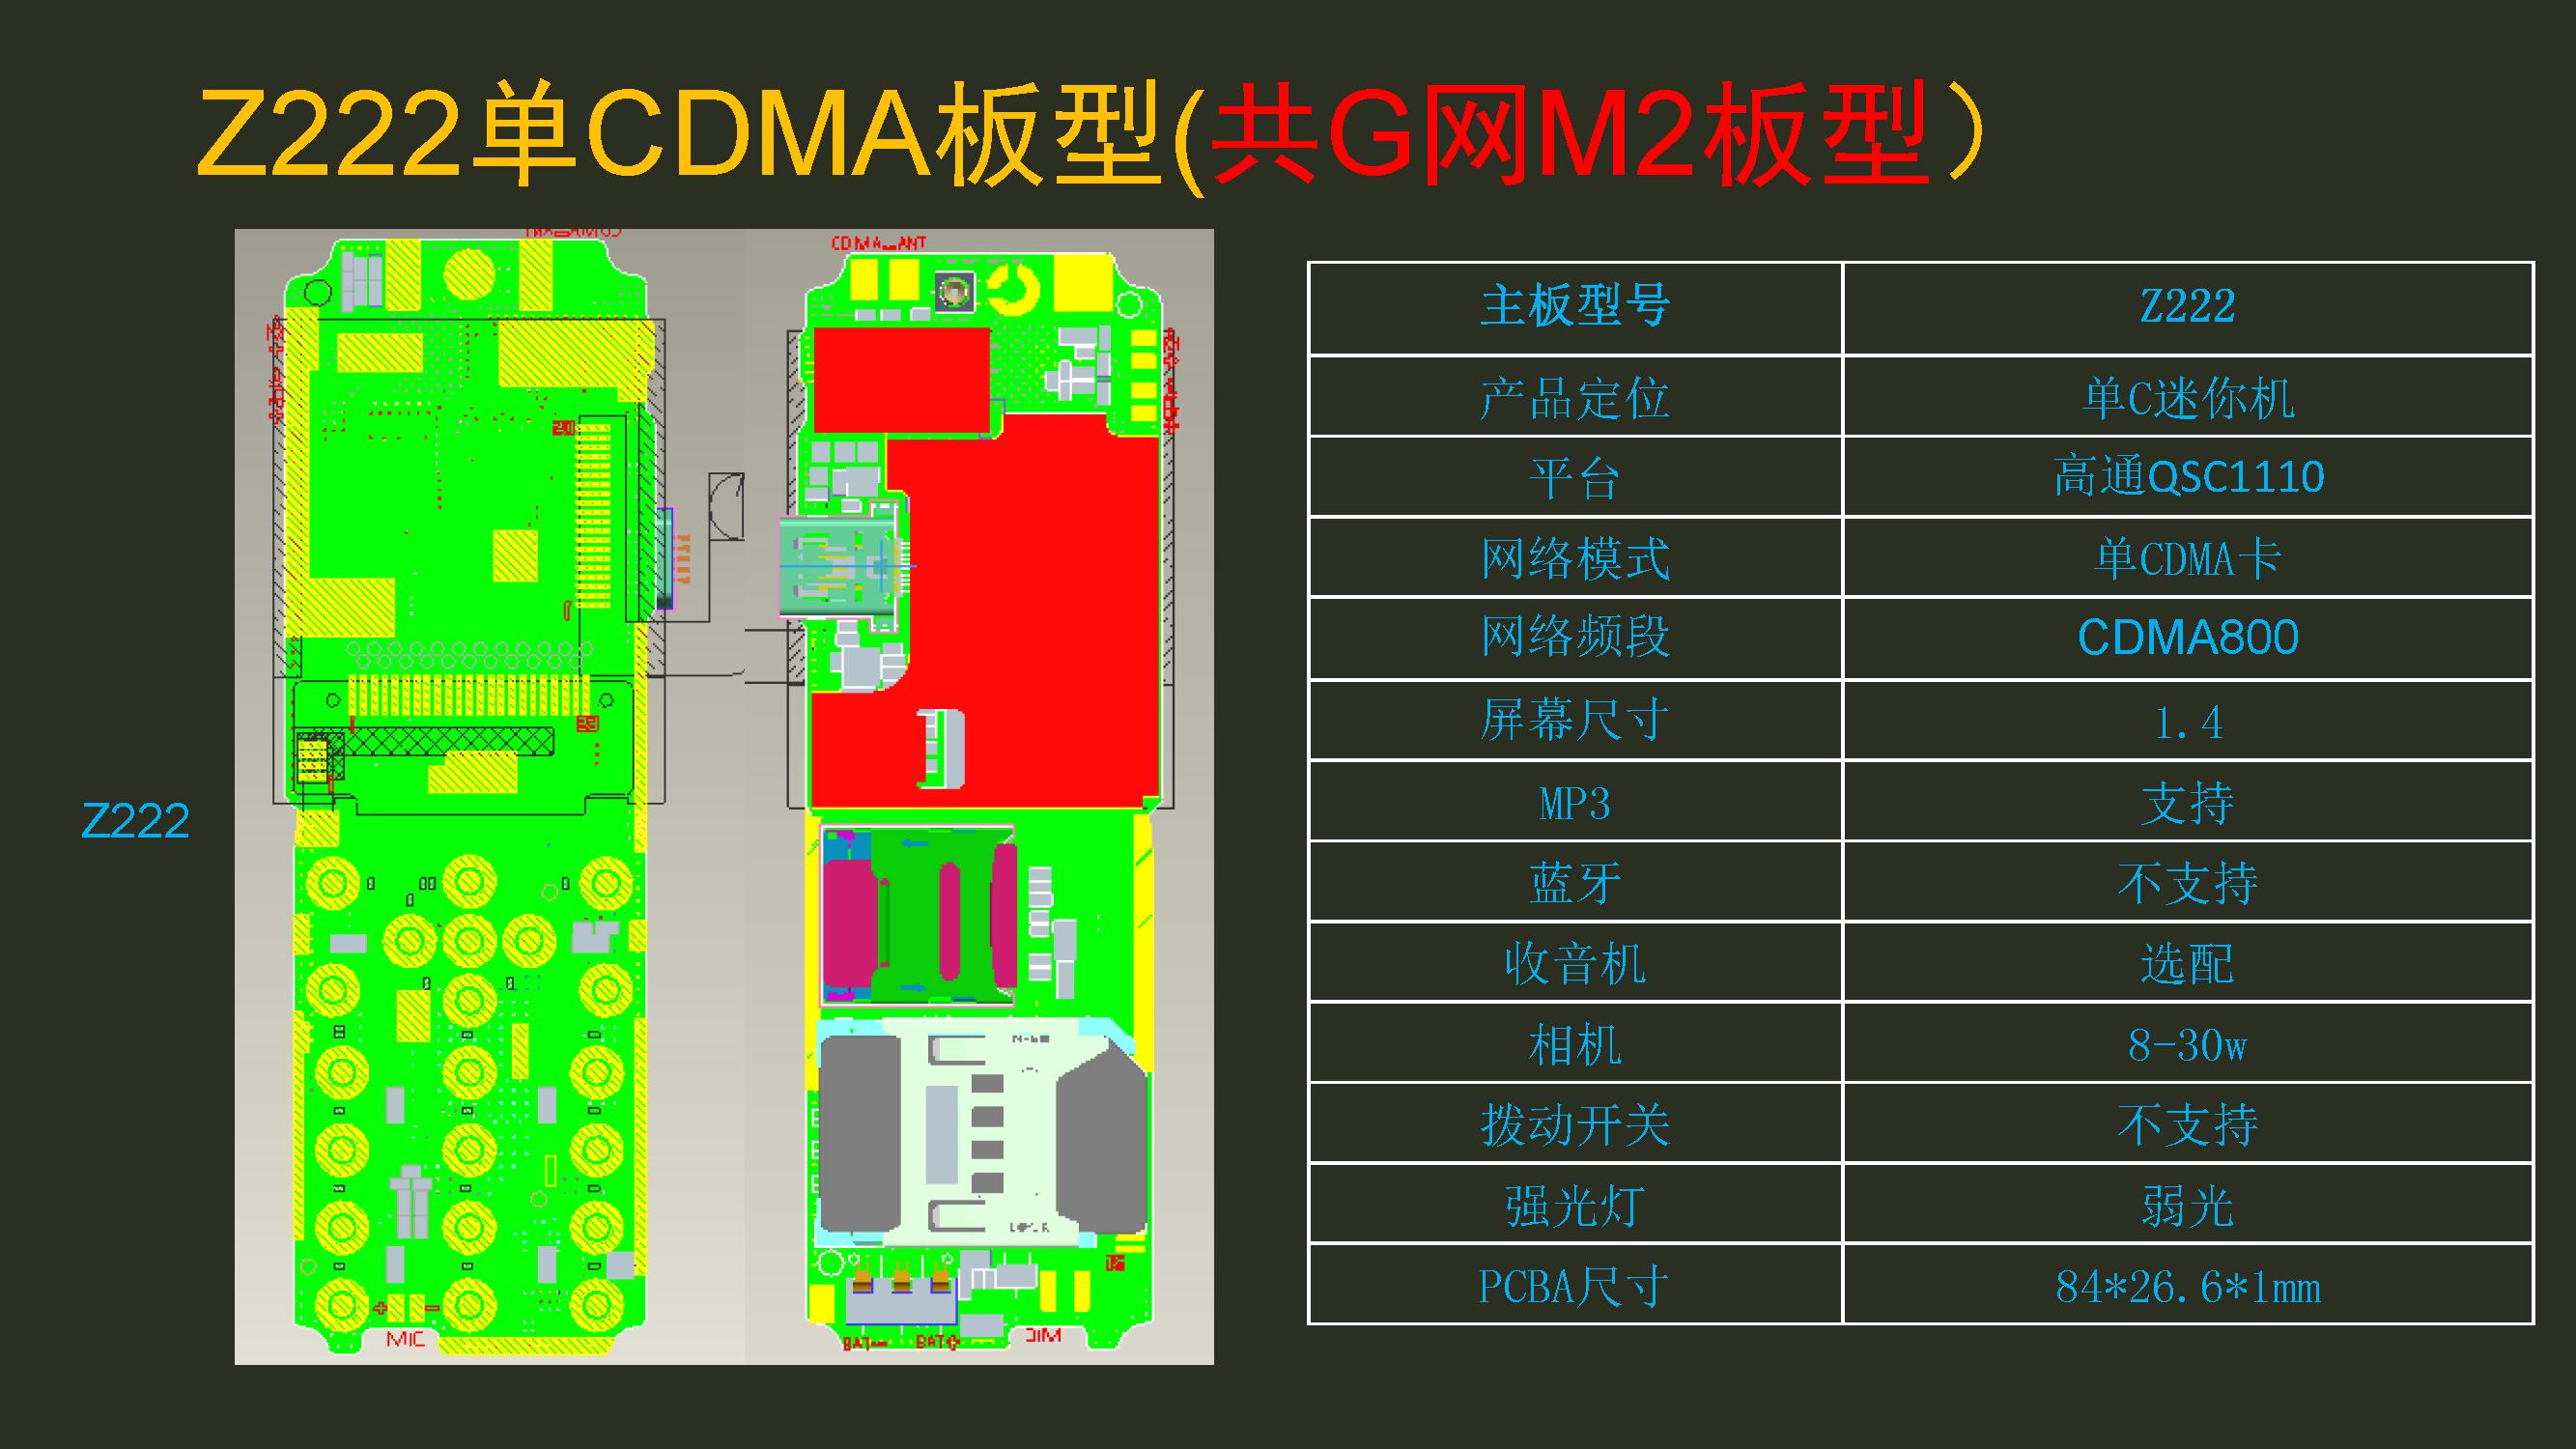 Z222_CDMA_G_M2